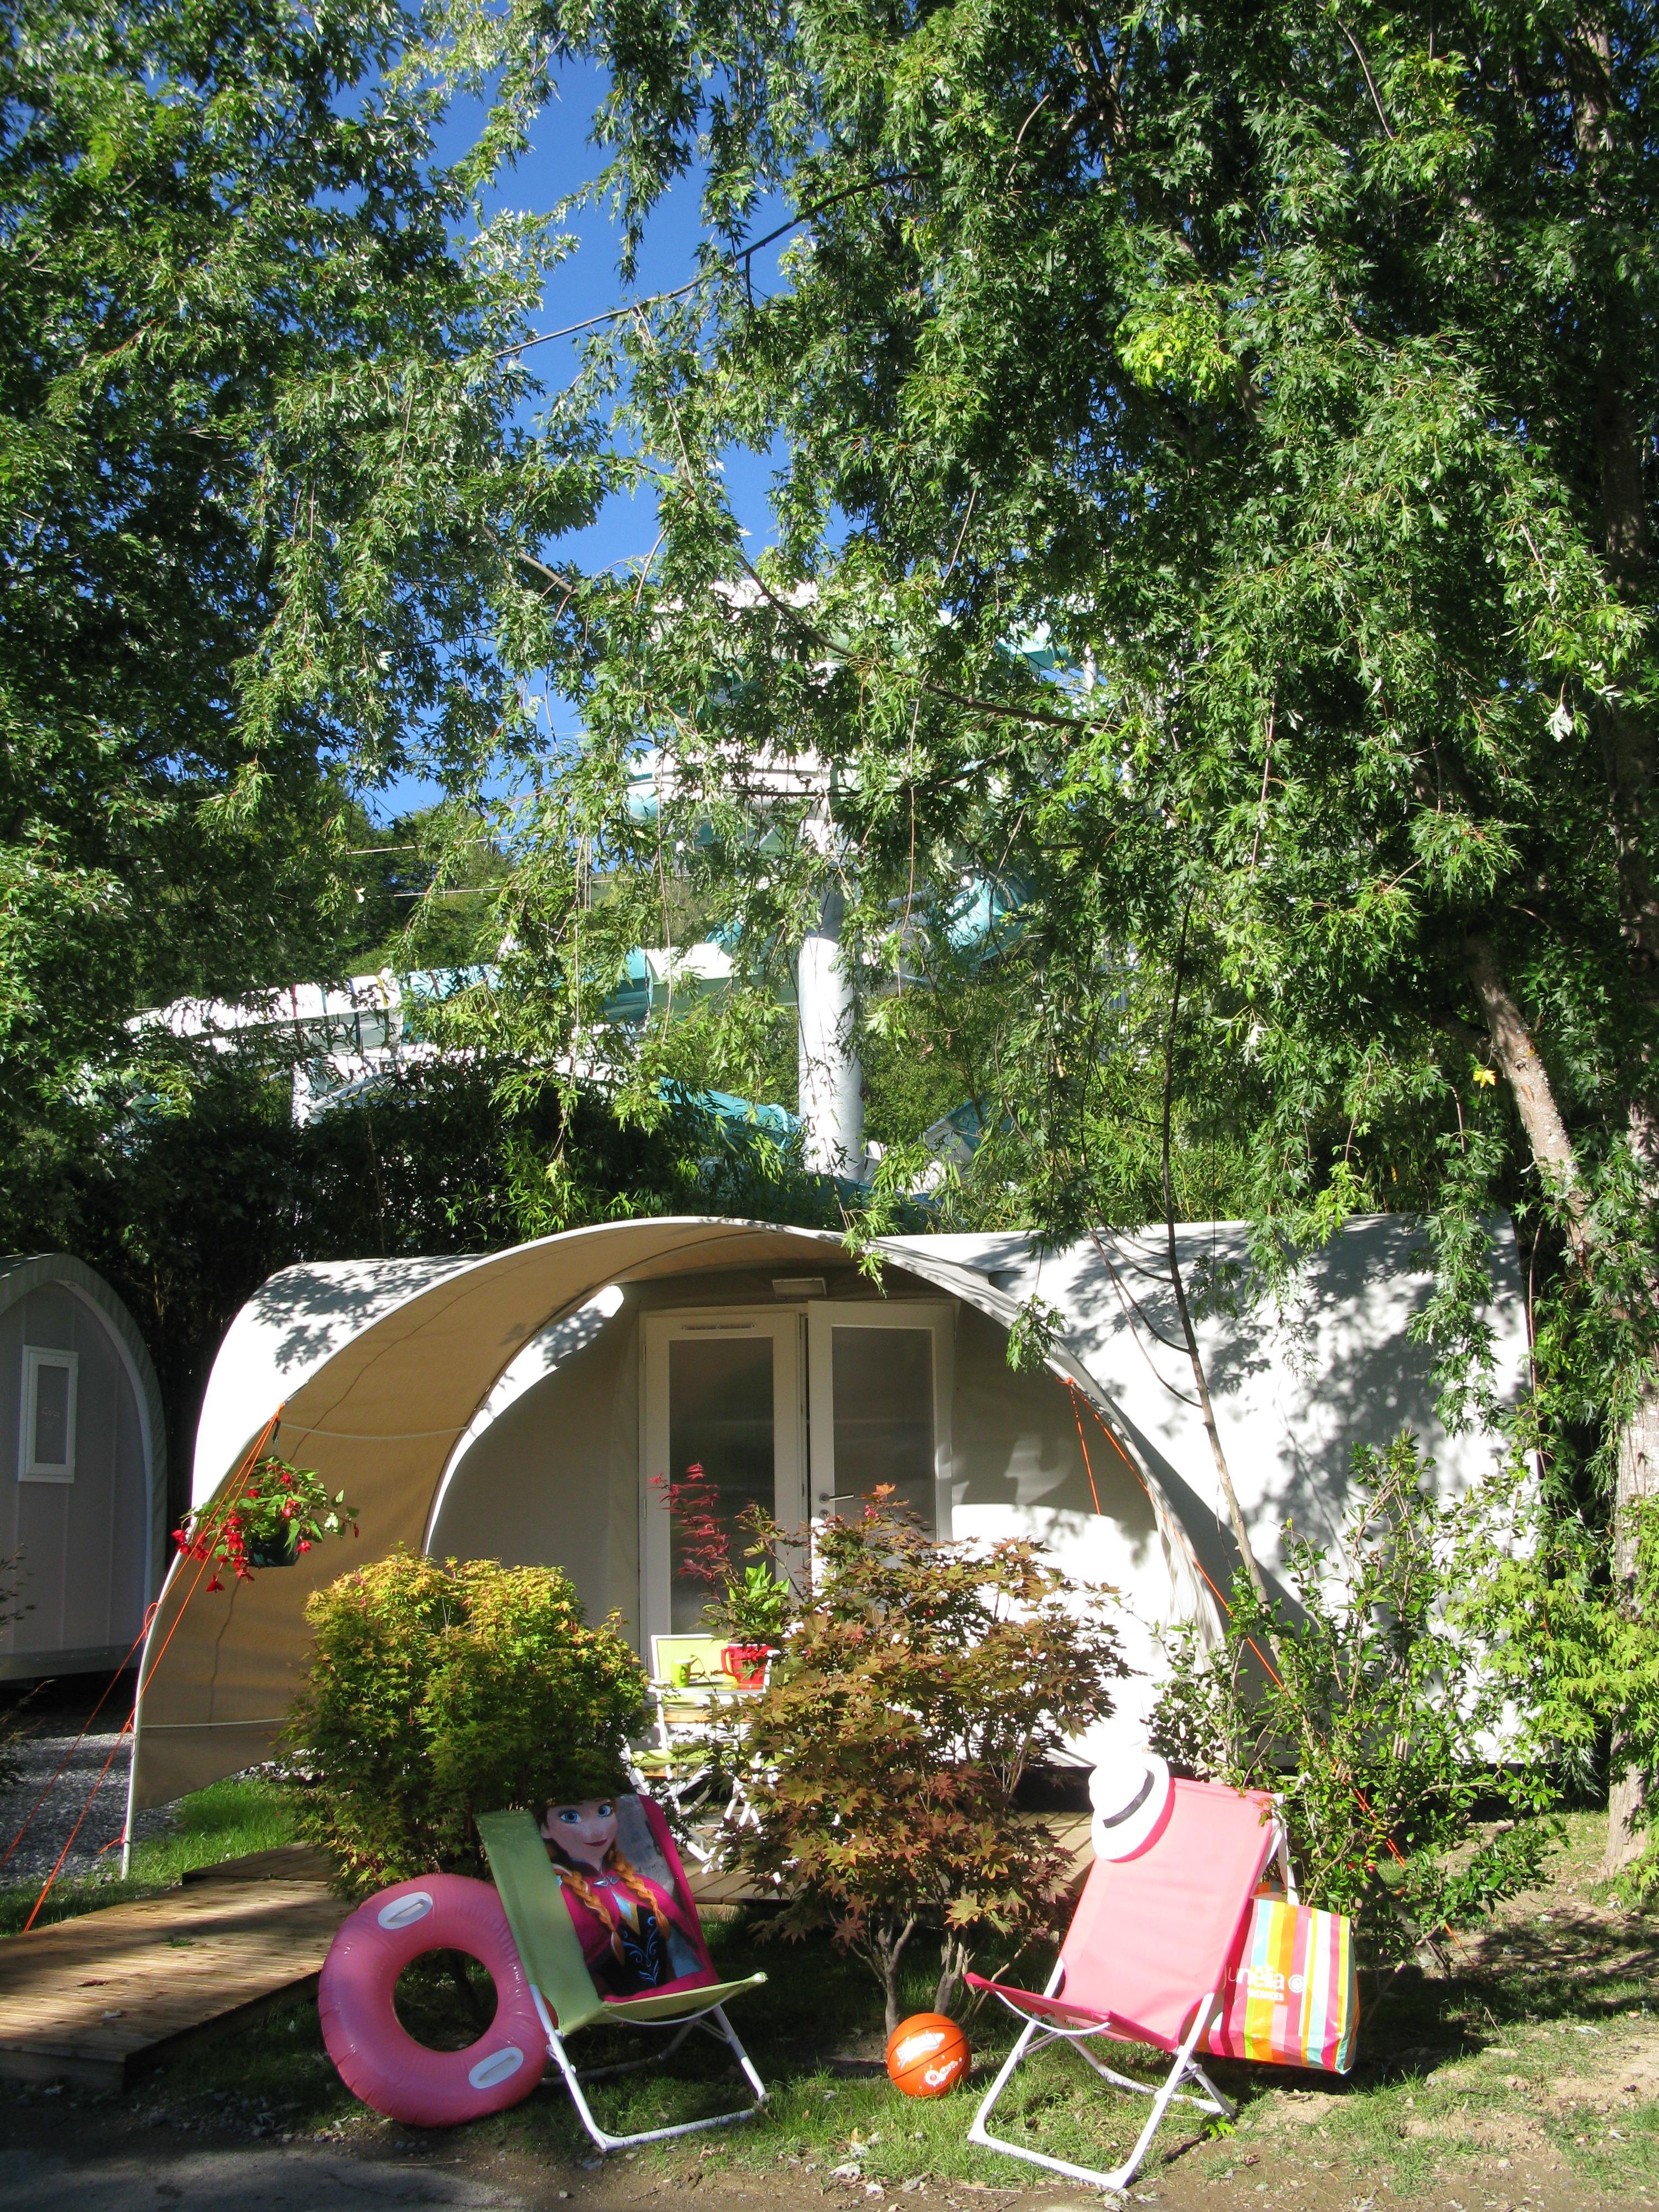 Location - Sunêlia Lodge Coco Sweet 16 M² (2 Chambres) - Sunêlia Camping Les 3 Vallées